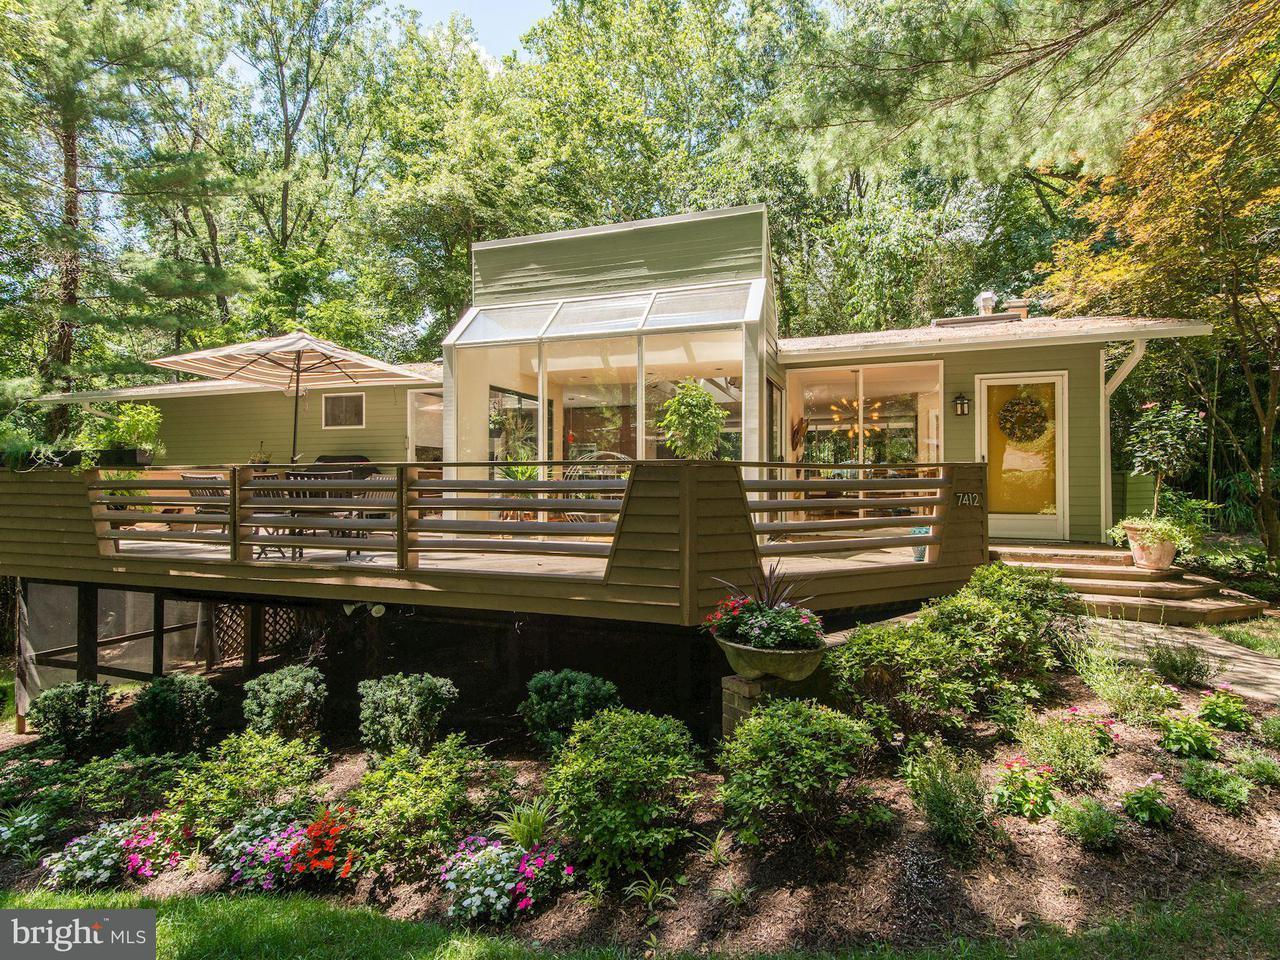 Single Family Home for Sale at 7412 REBECCA Drive 7412 REBECCA Drive Alexandria, Virginia 22307 United States